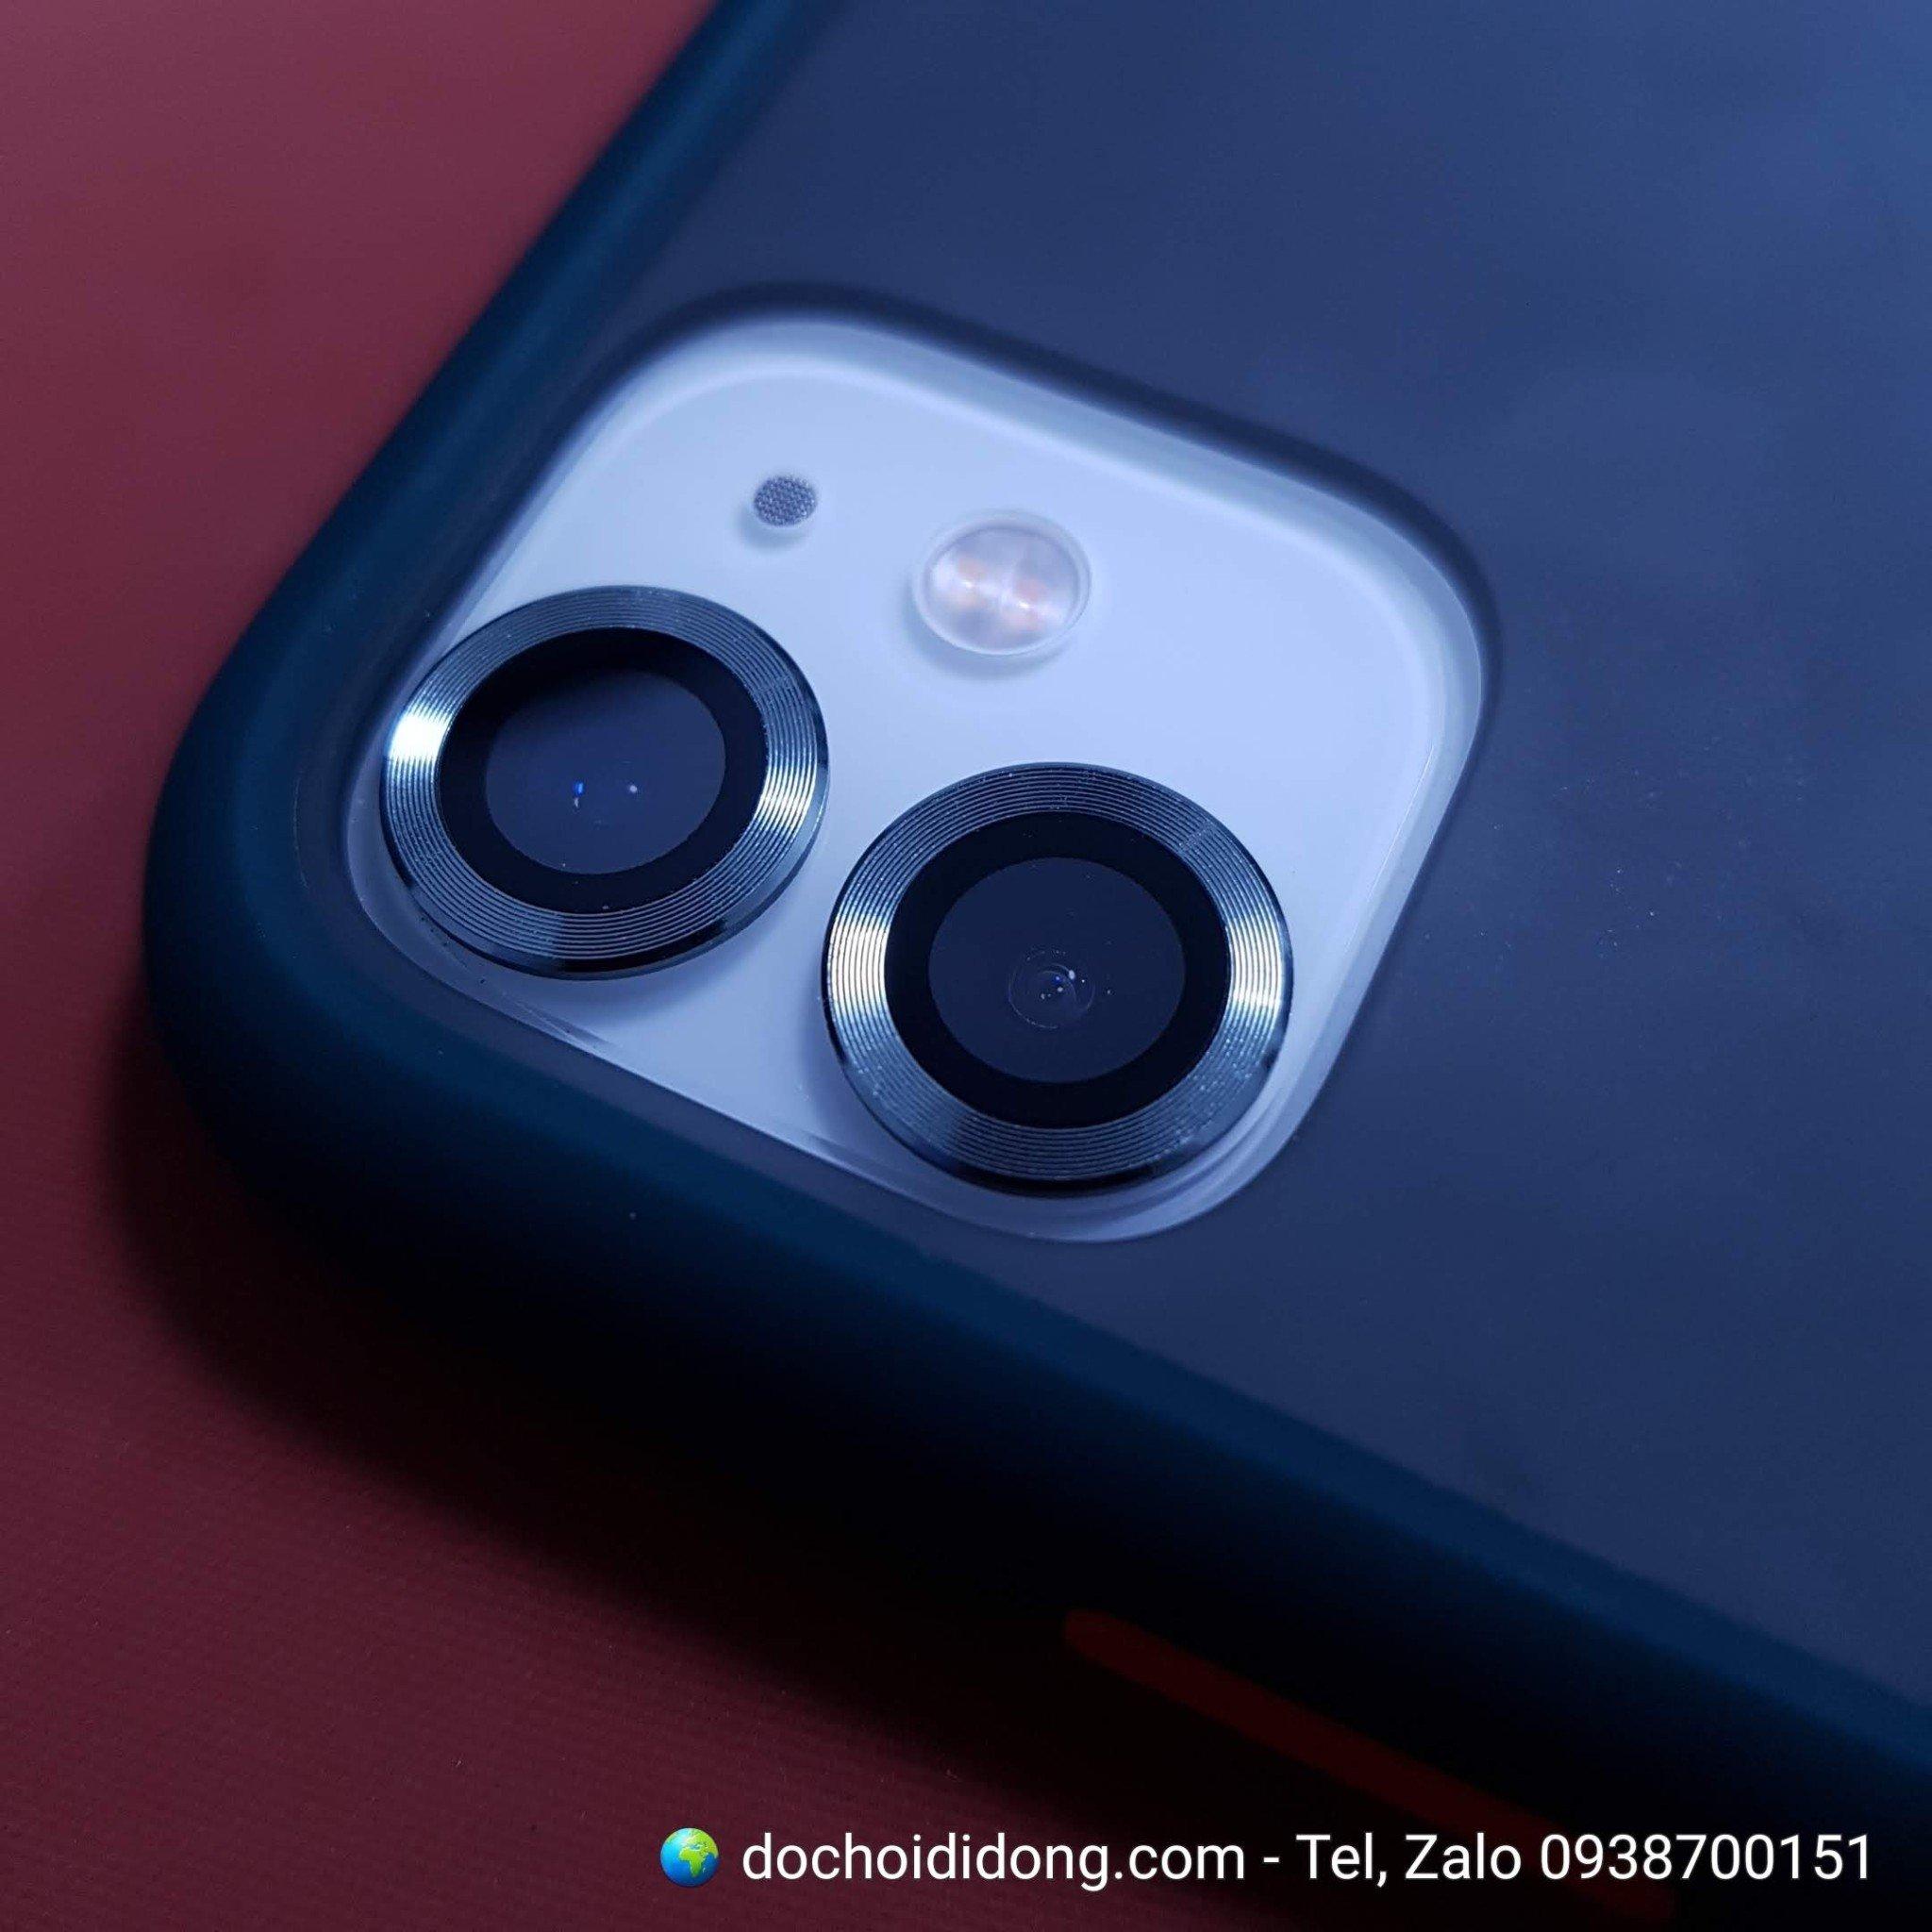 op-lung-iphone-11-benks-magic-smooth-1-5mm